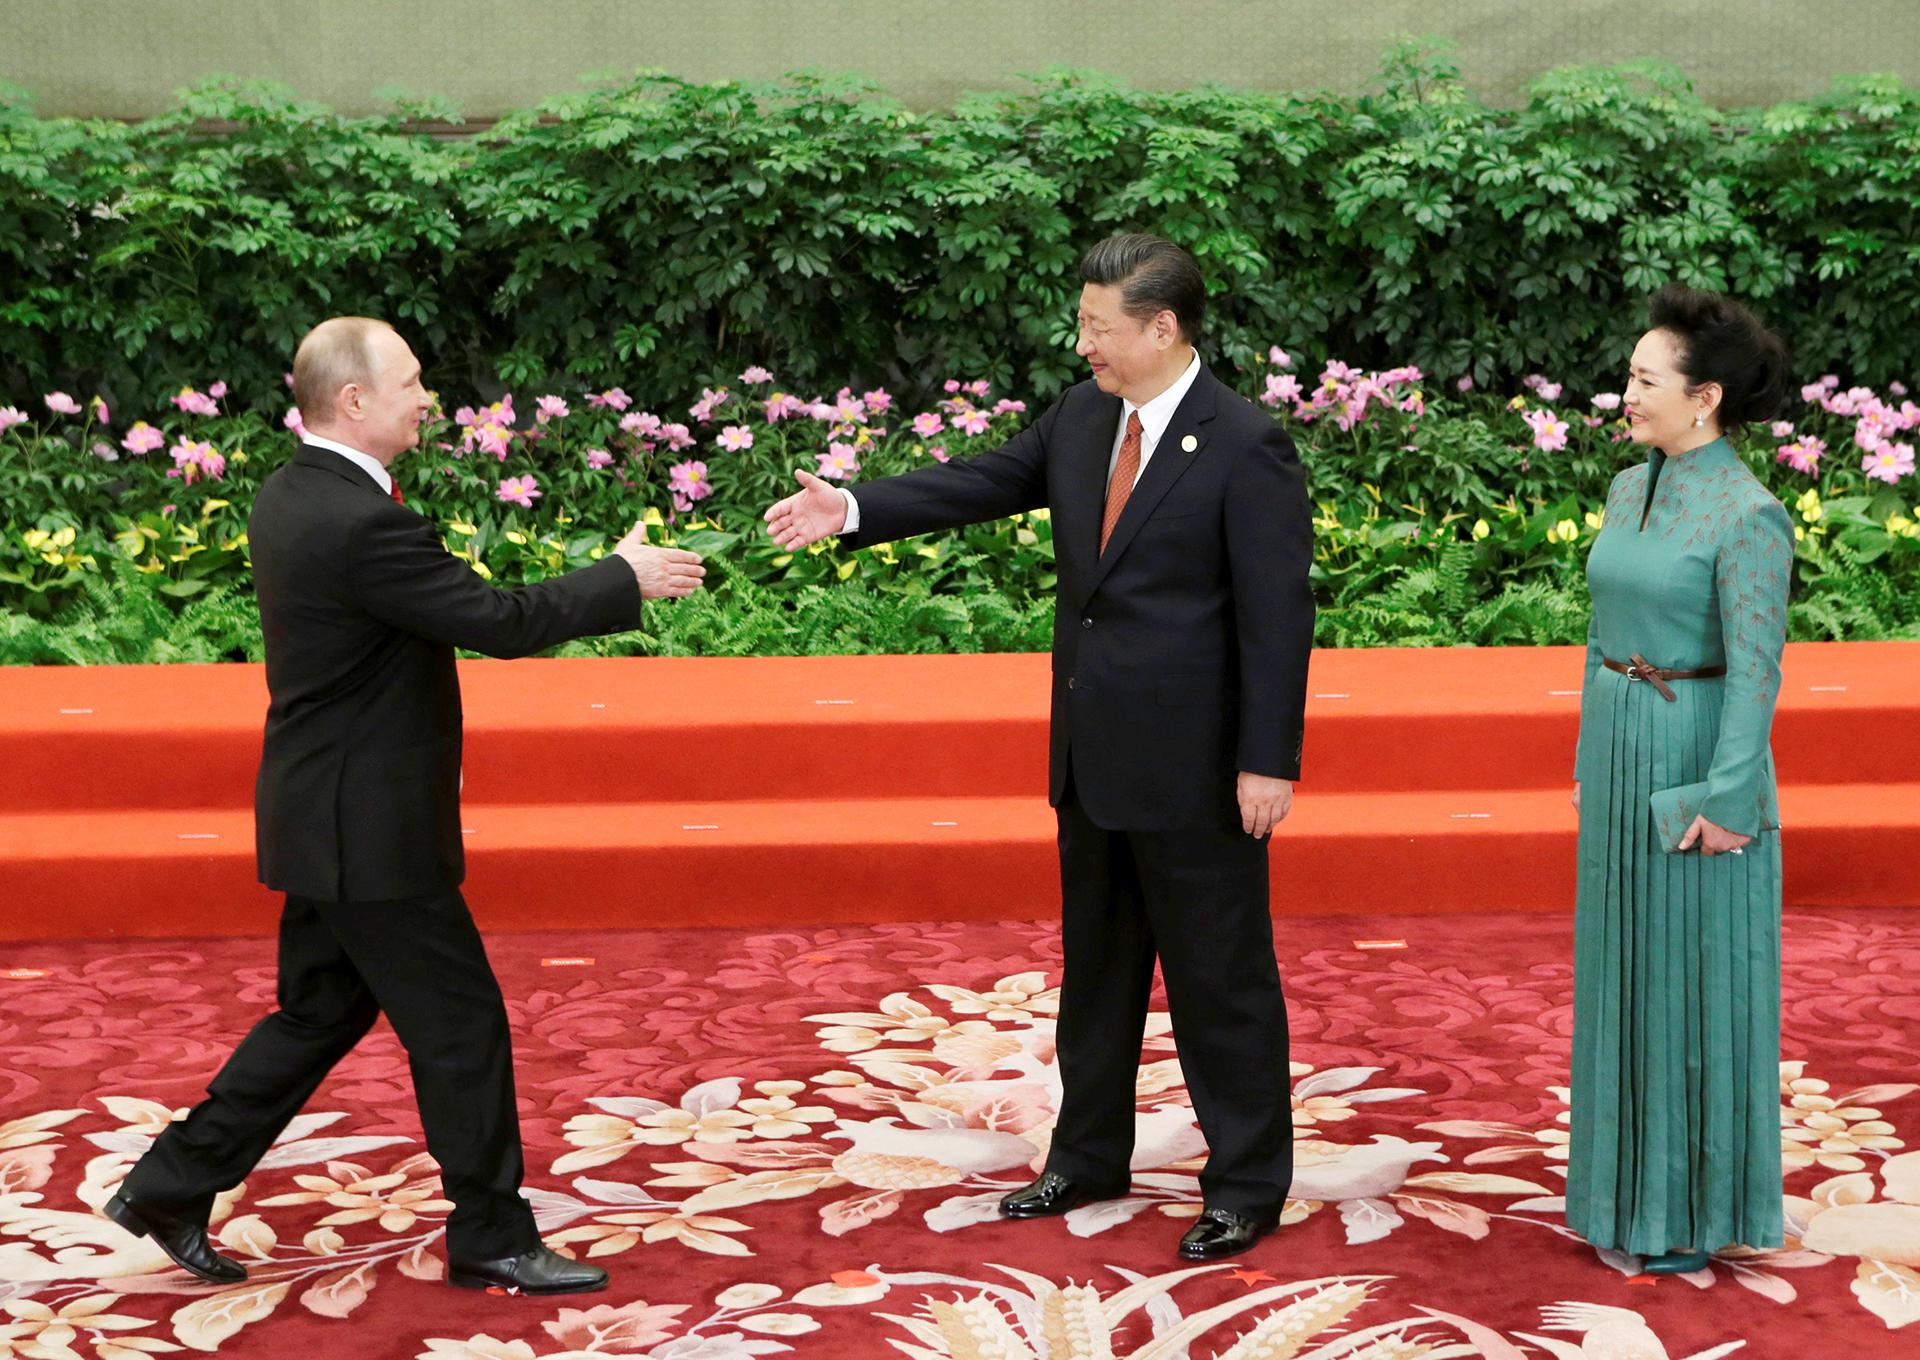 Xi Jinping, y su mujer Peng Liyuan saludando a Vladimir Putin